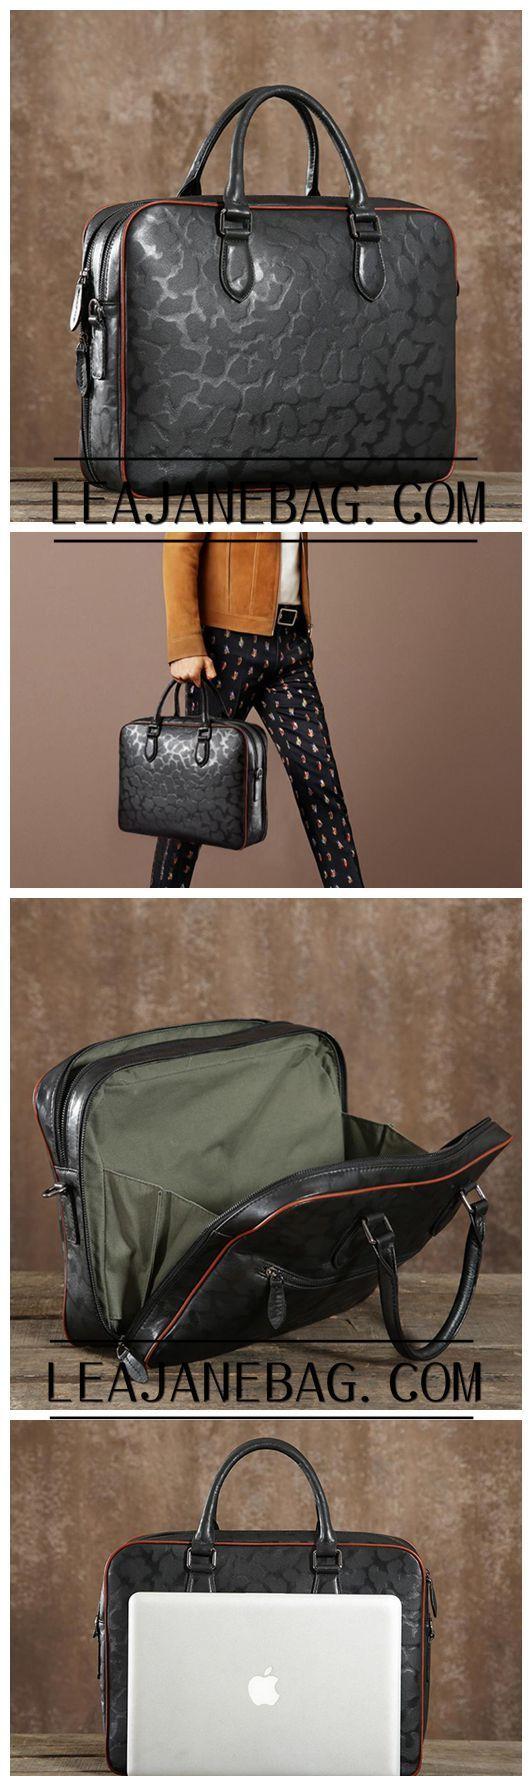 Laptop Briefcase,Handmade Bag,Popular Type GLT019 #handmadebag